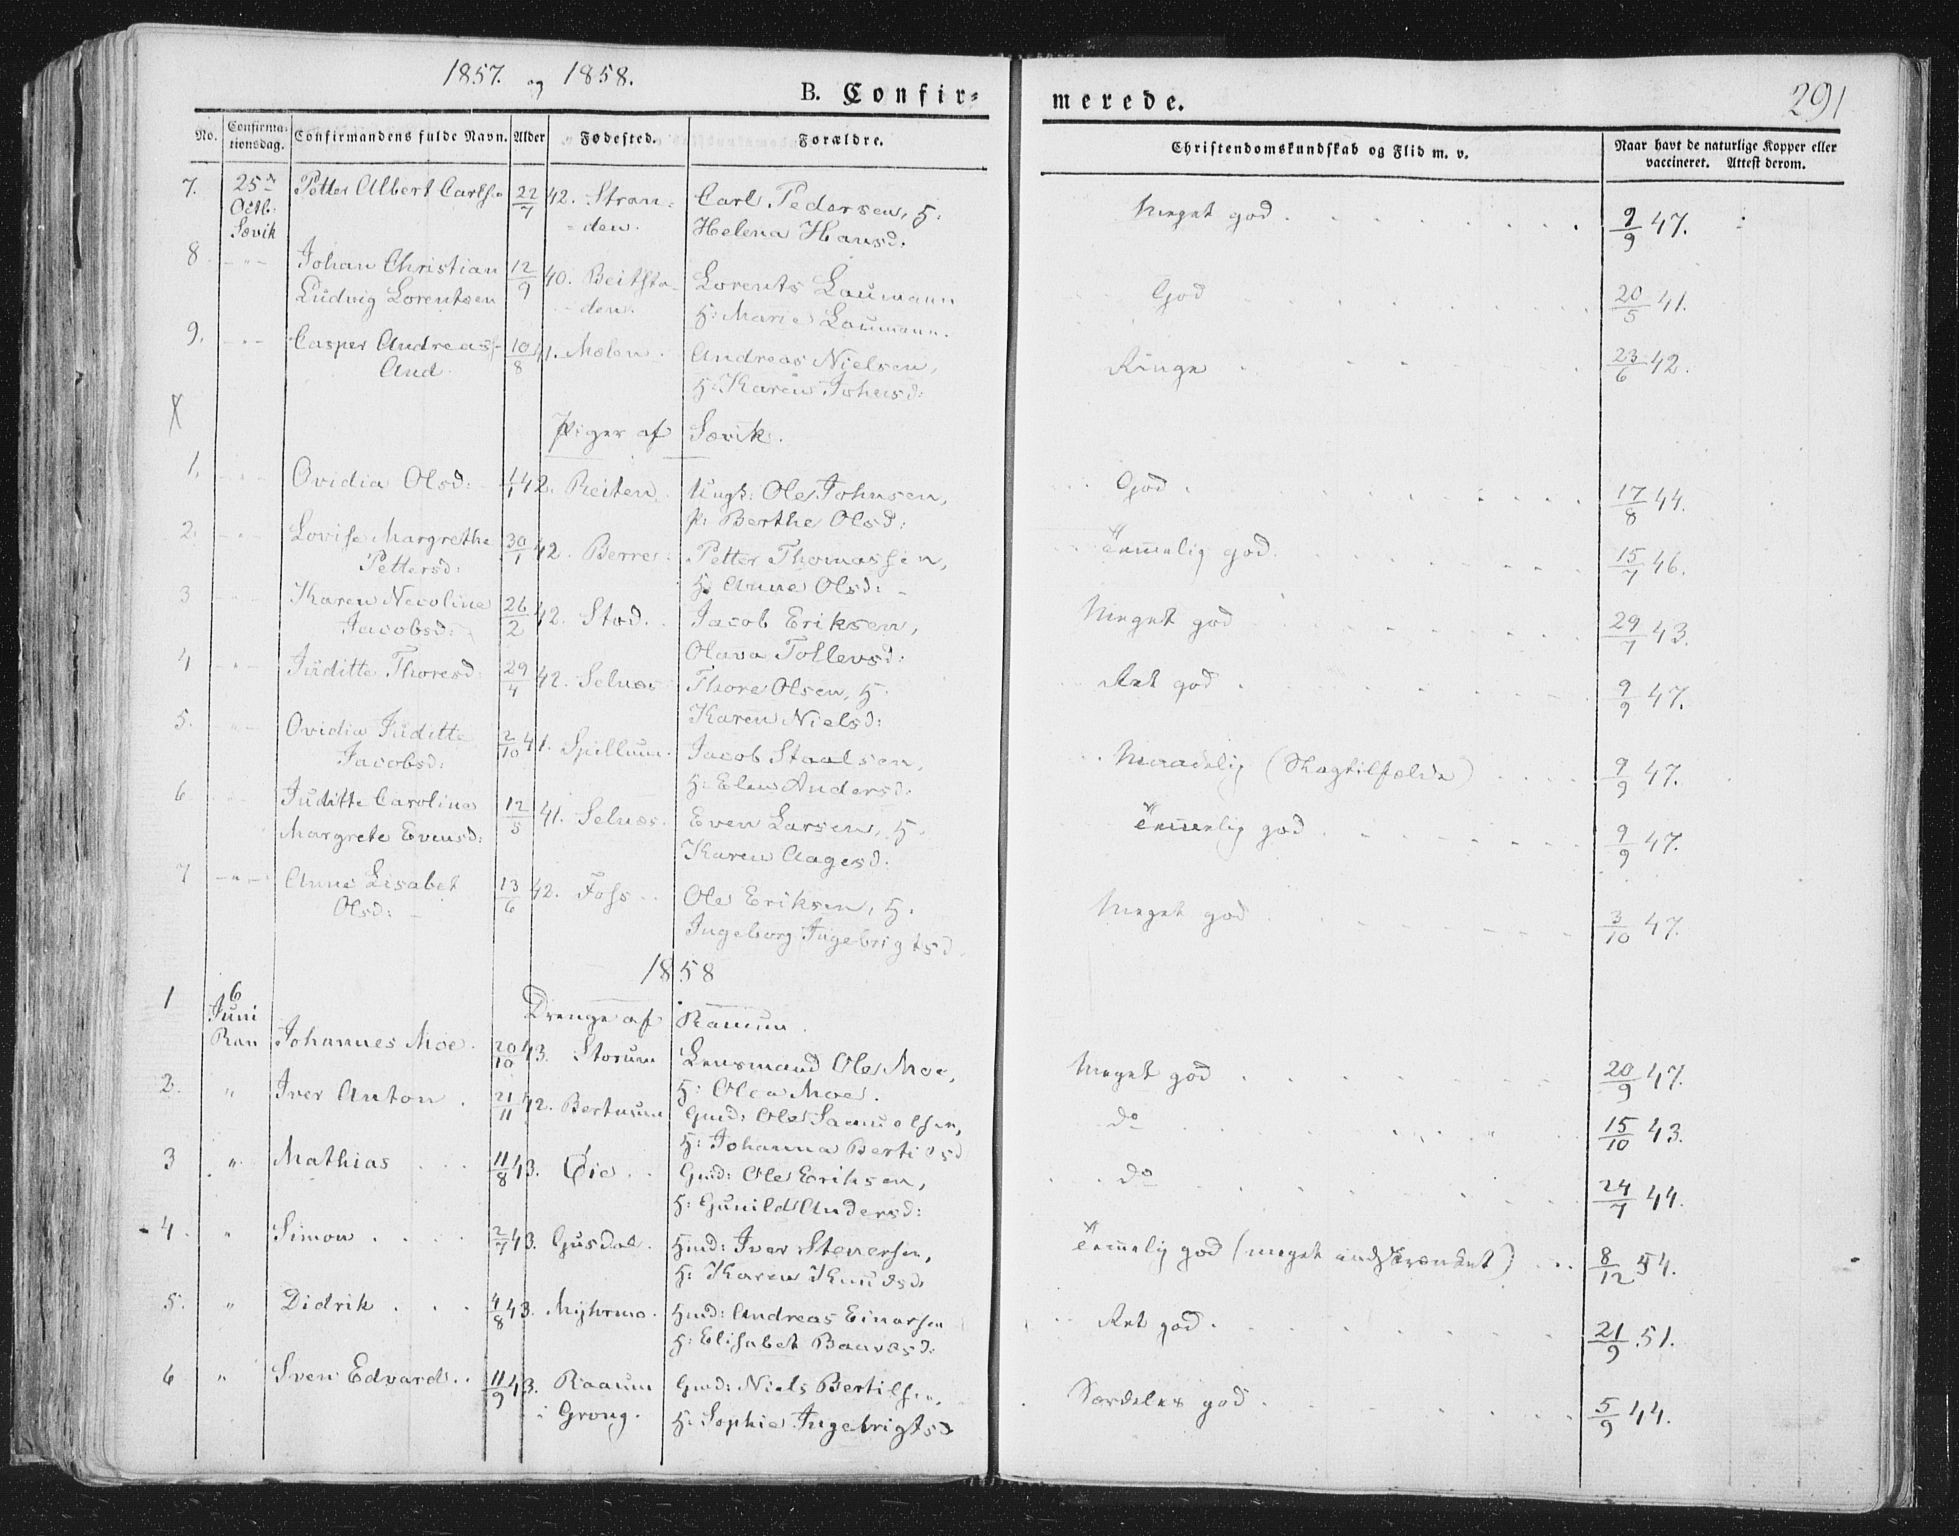 SAT, Ministerialprotokoller, klokkerbøker og fødselsregistre - Nord-Trøndelag, 764/L0551: Ministerialbok nr. 764A07a, 1824-1864, s. 291